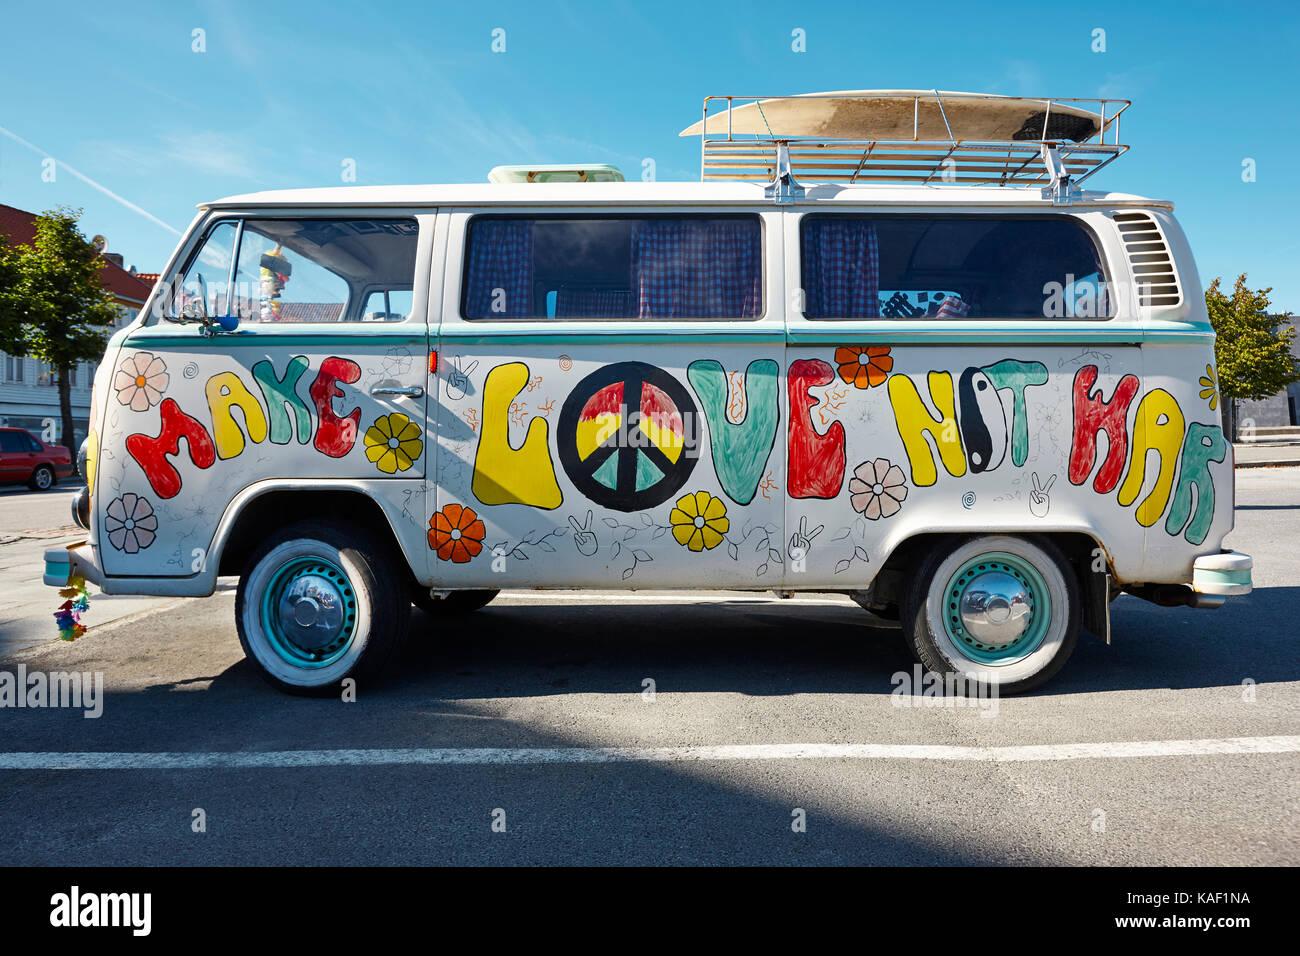 c5756fbd1c Hippie van retro style. Make love not war. Psychedelic vehicle - Stock Image